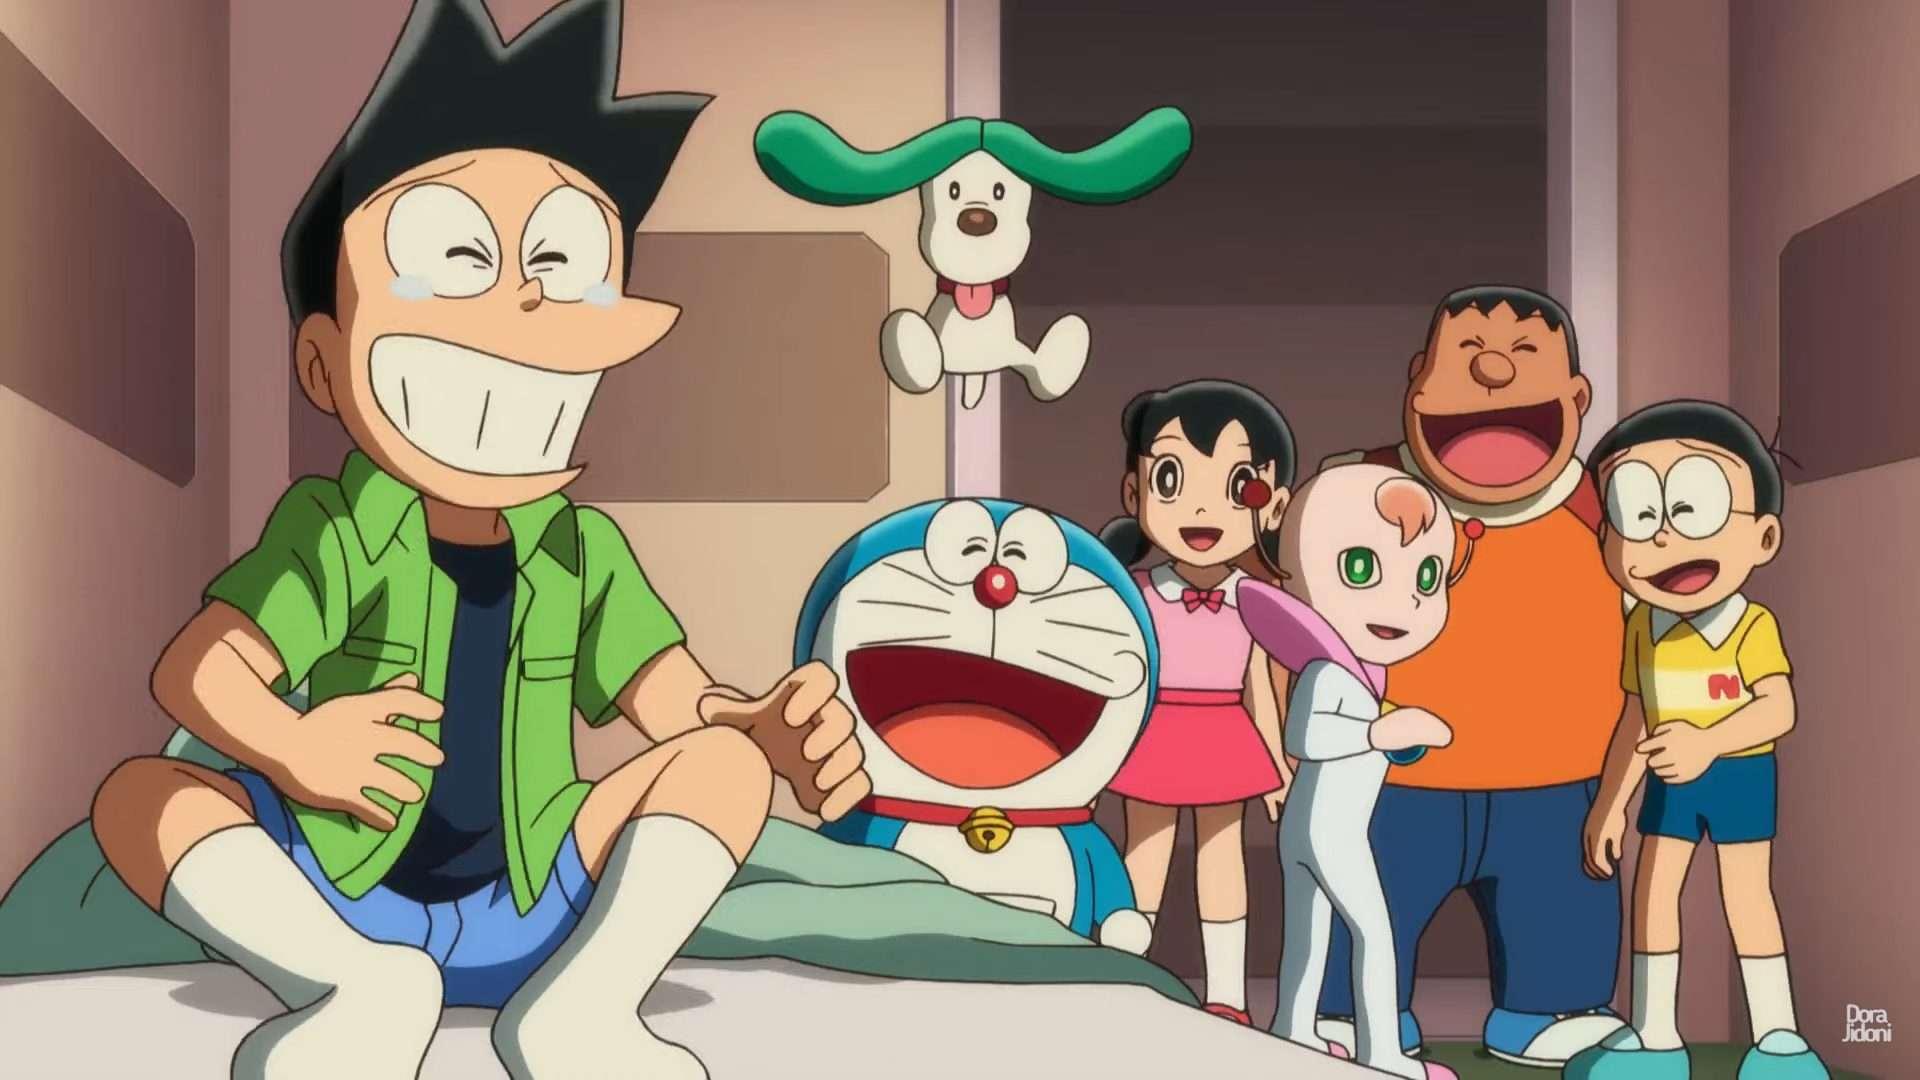 Wallpaper Doraemon Movie 41 Nobita No Little Star Wars Anime Top Wallpaper